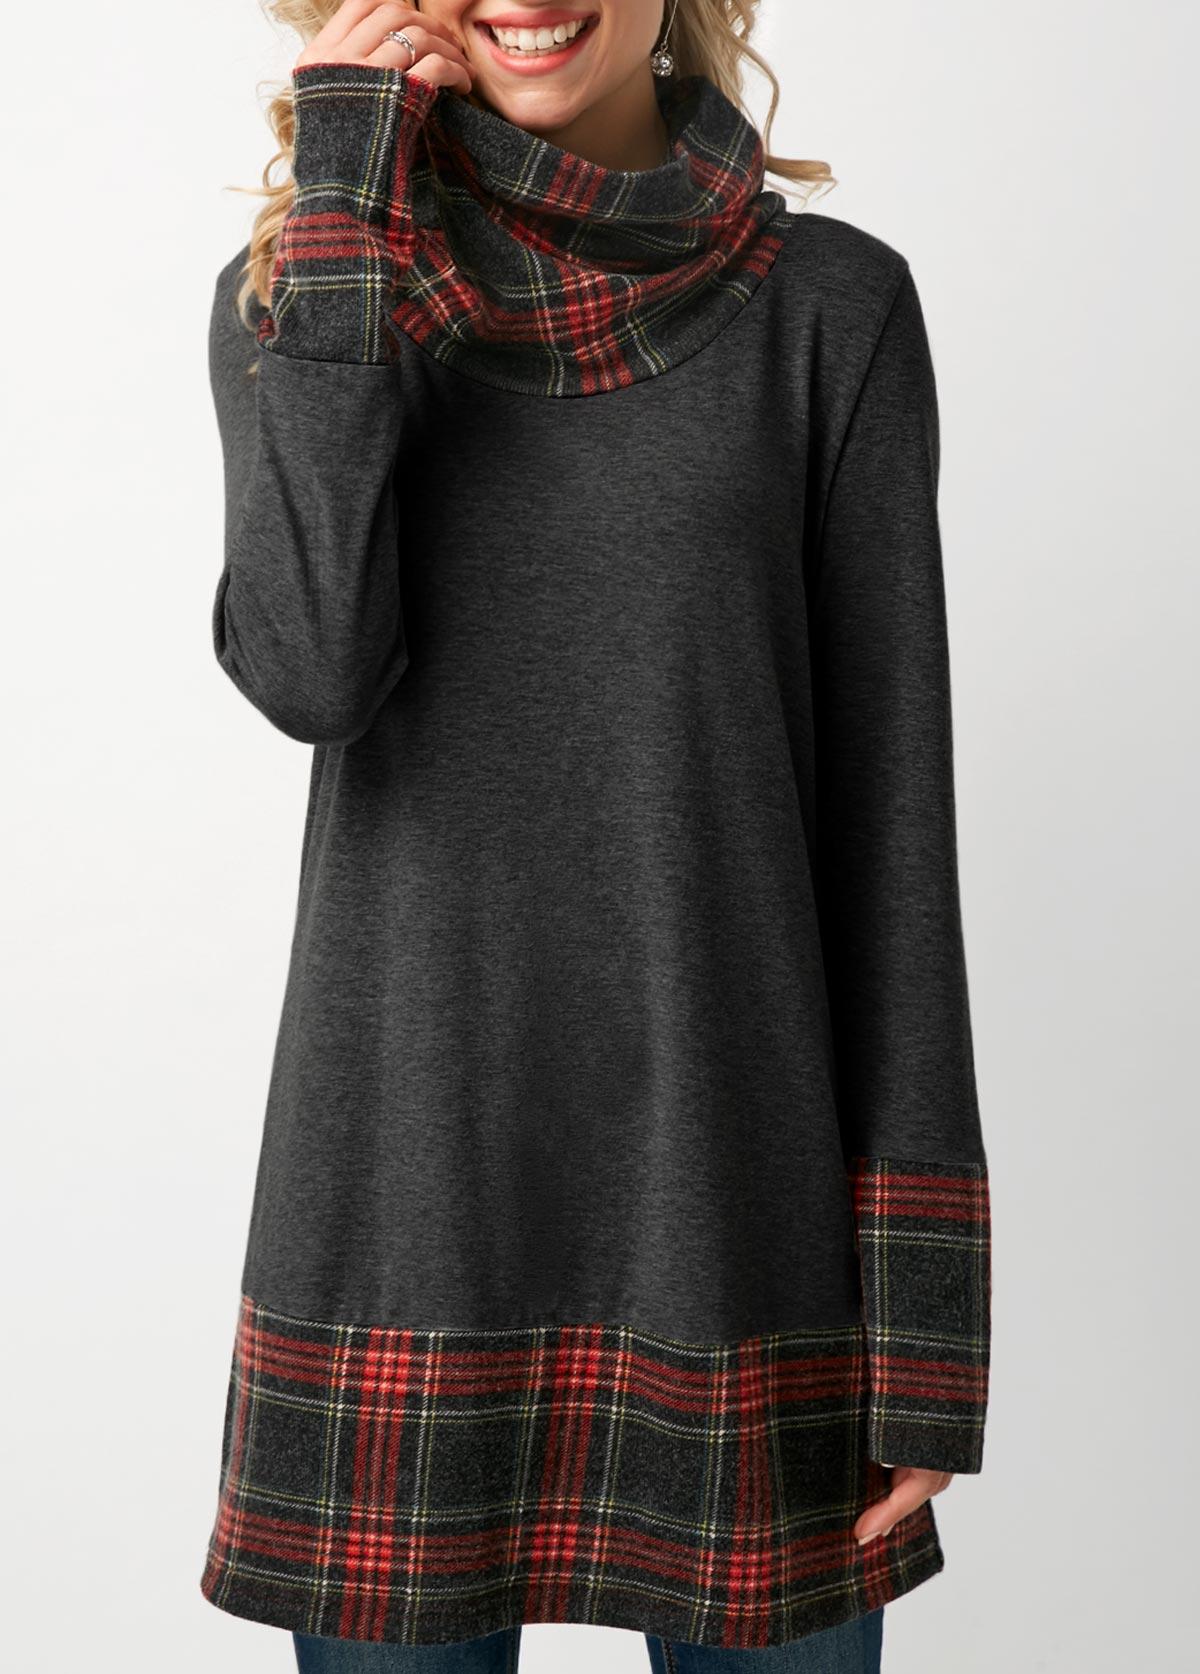 Cowl Neck Patchwork Plaid Dark Grey T Shirt